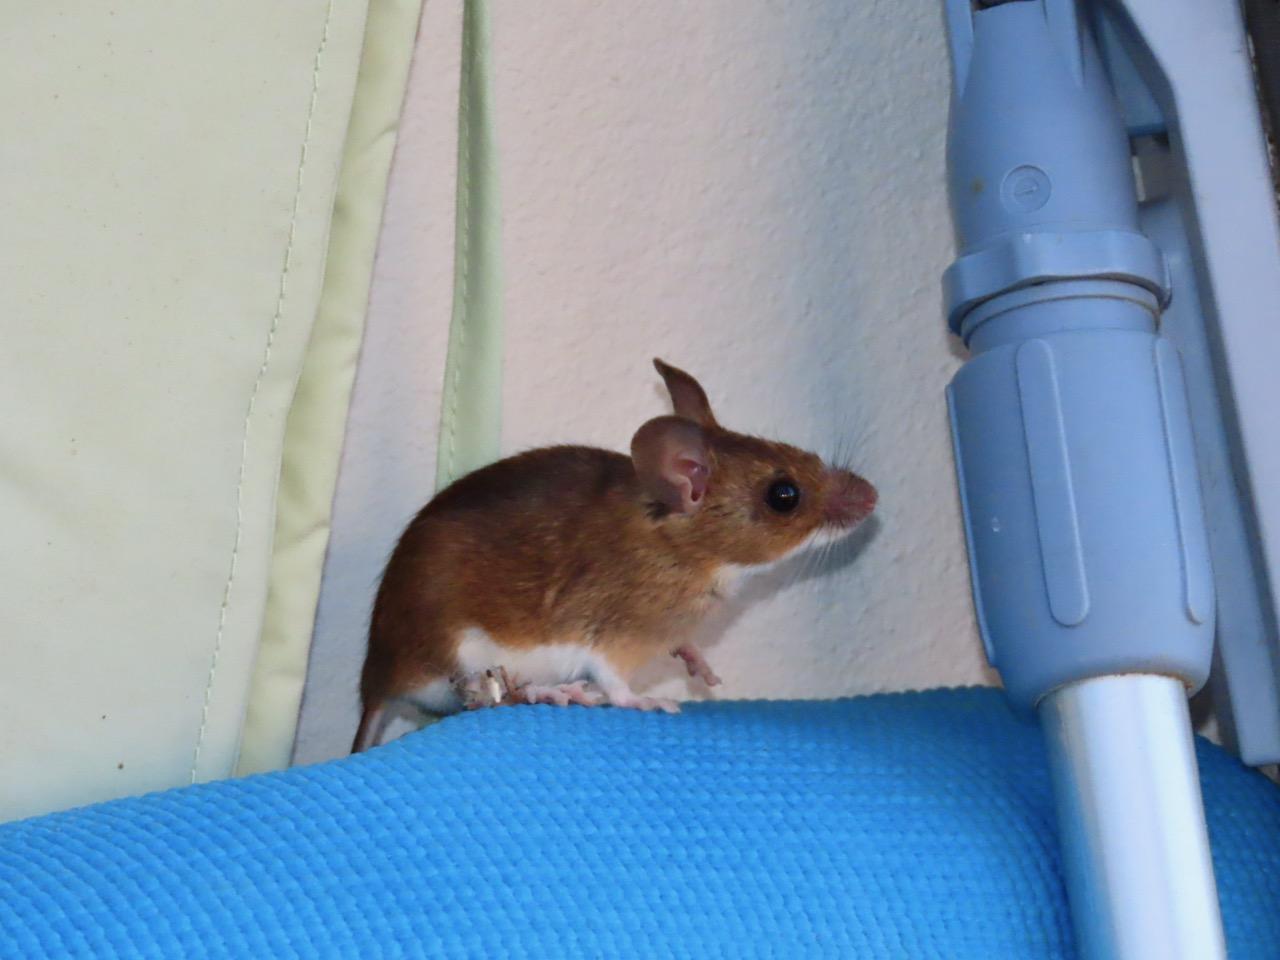 Wood mouse on yoga mat